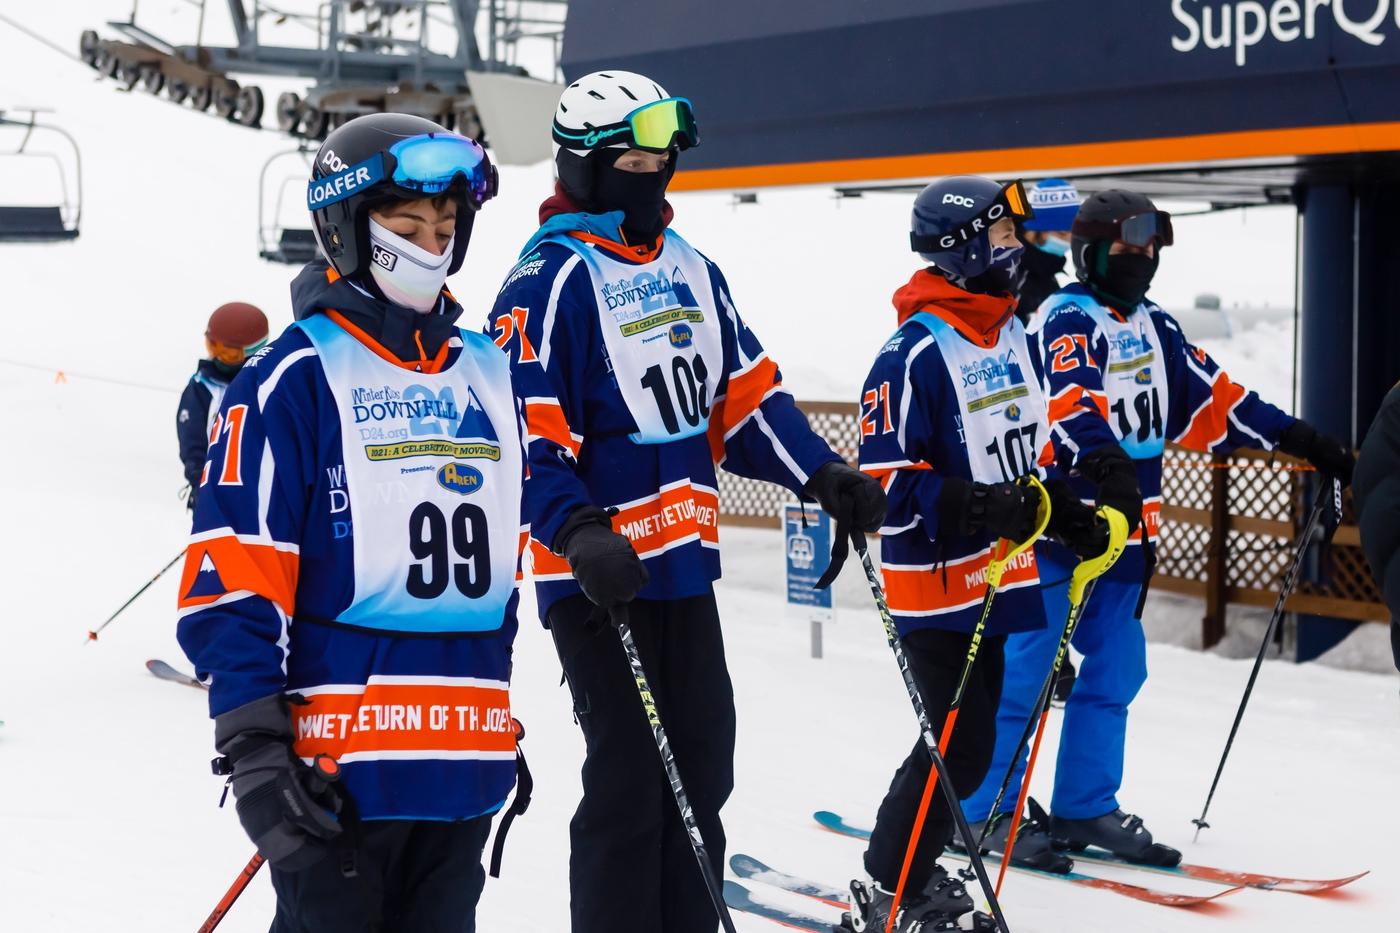 WinterKids Downhill 24 2021 SDP 2706